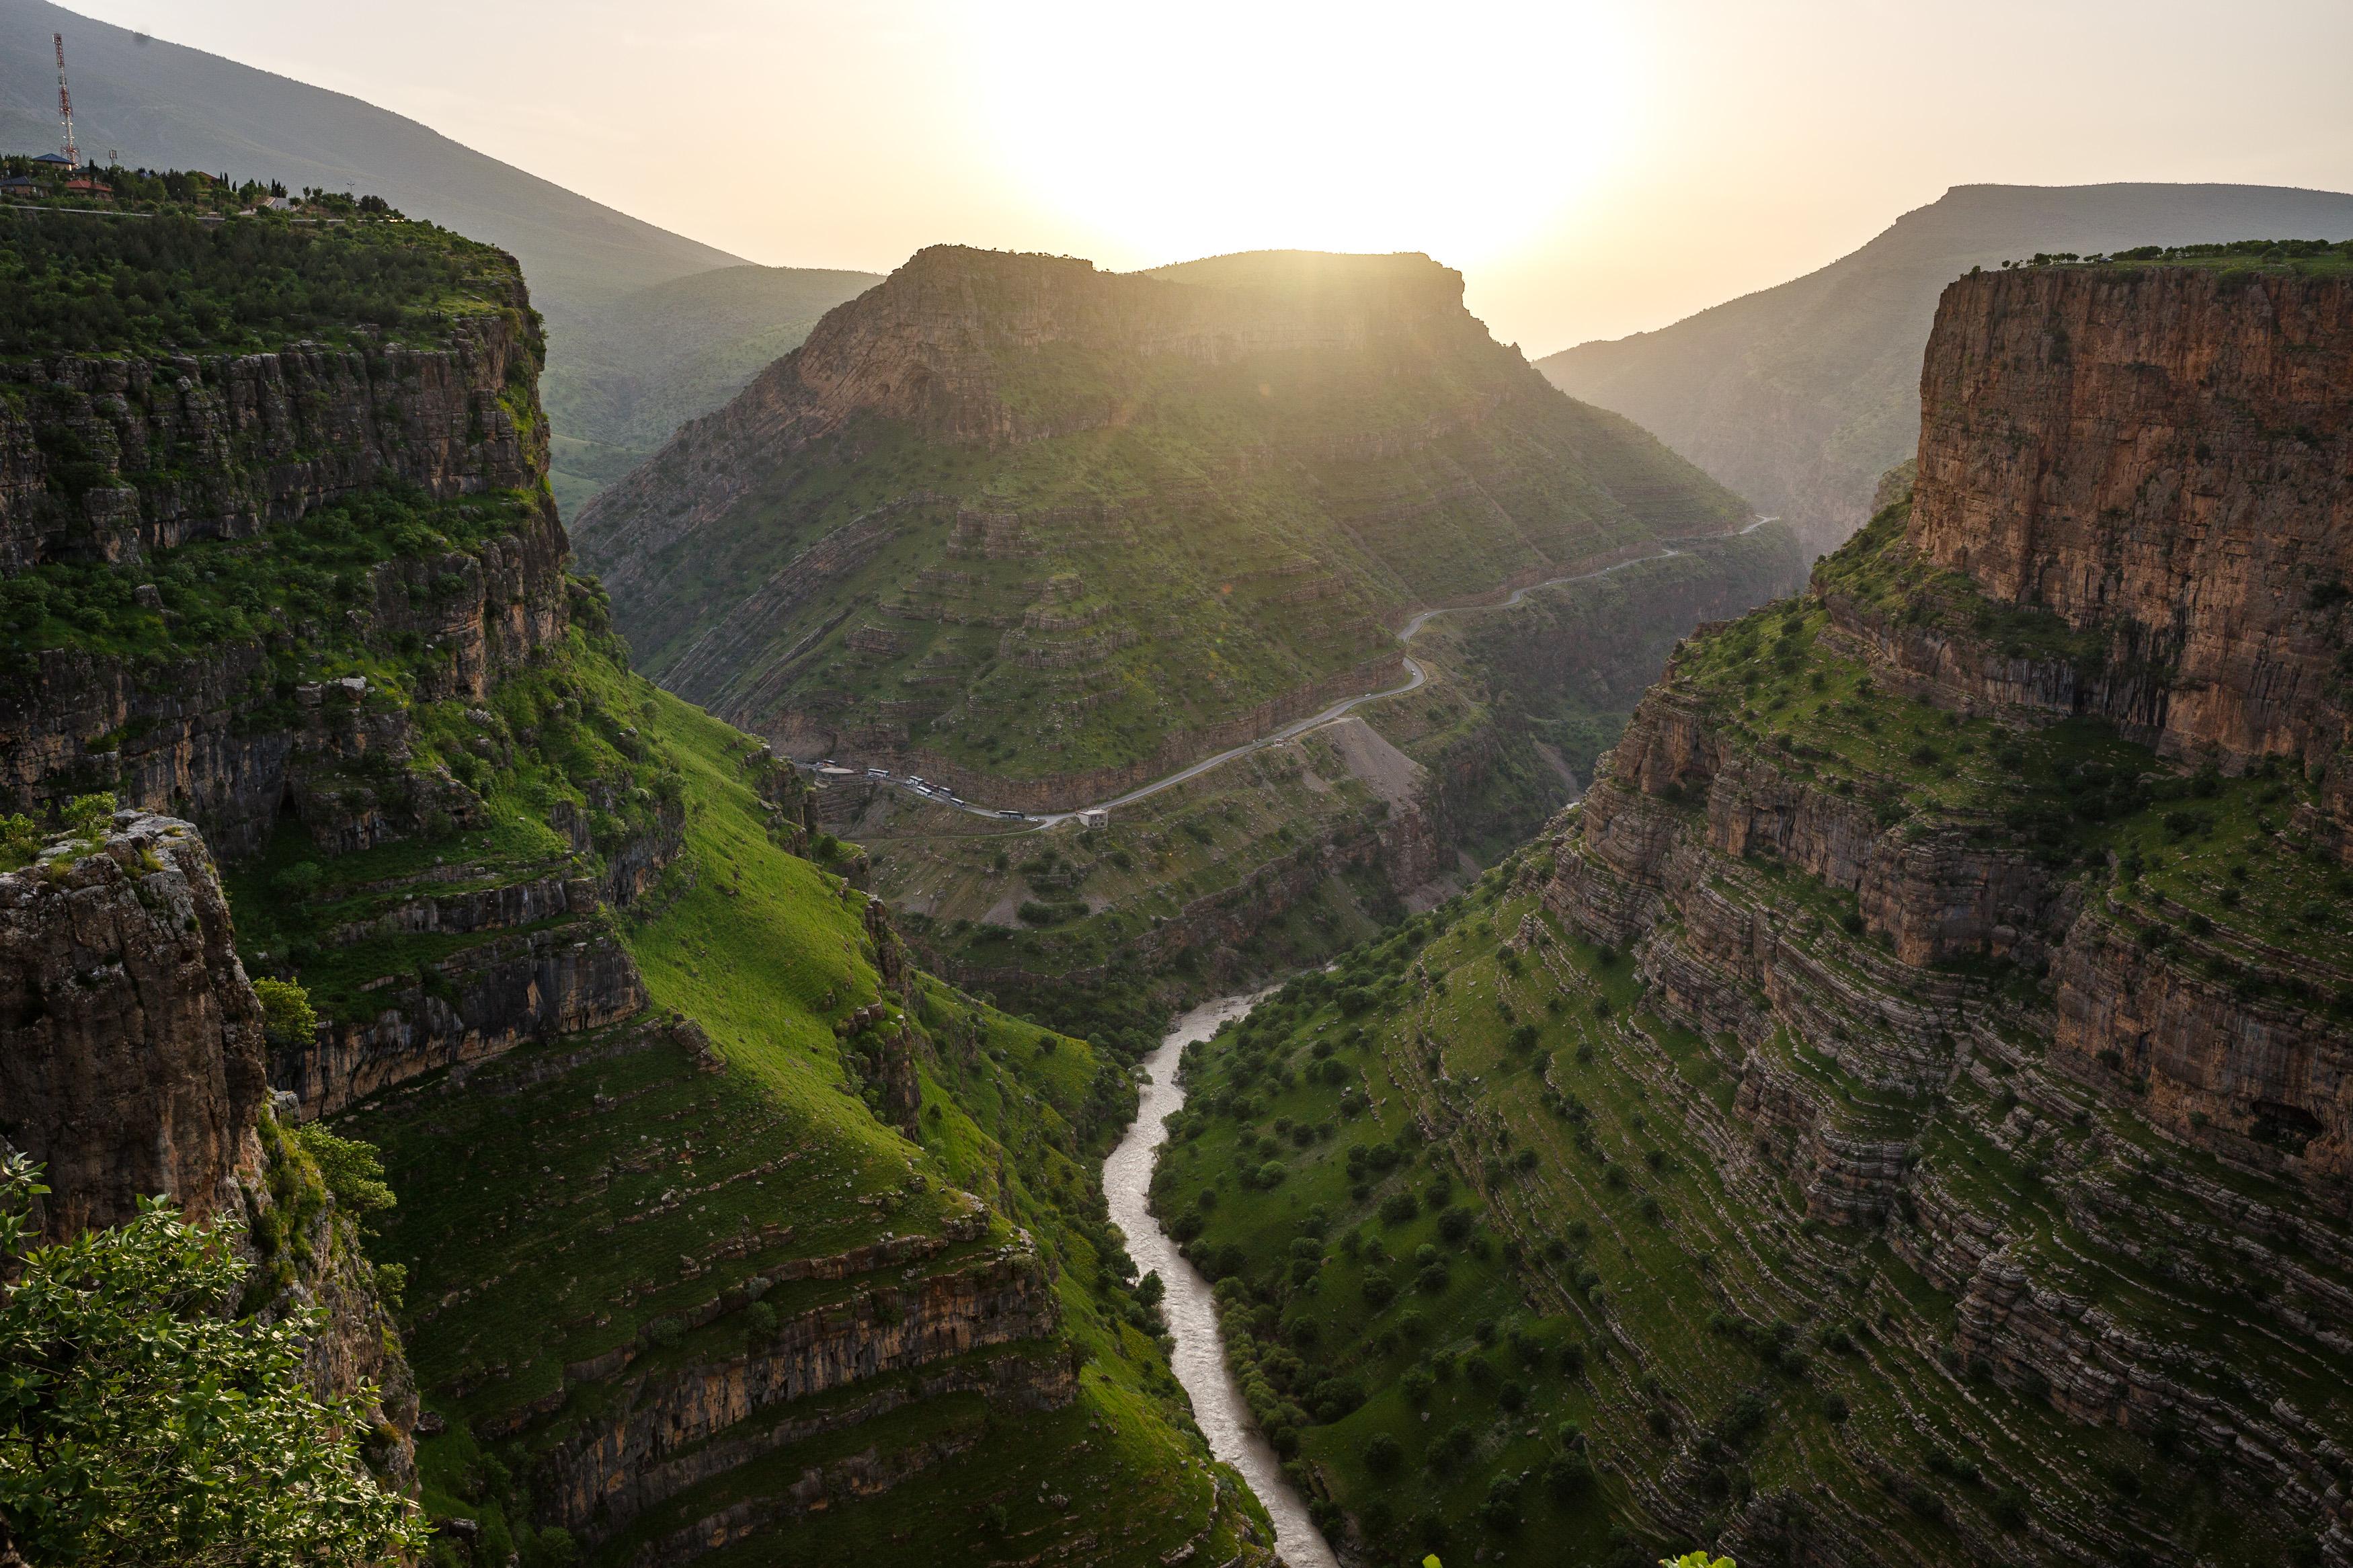 @DavidLohmueller-Irak-Kurdistan-2-7L2B99